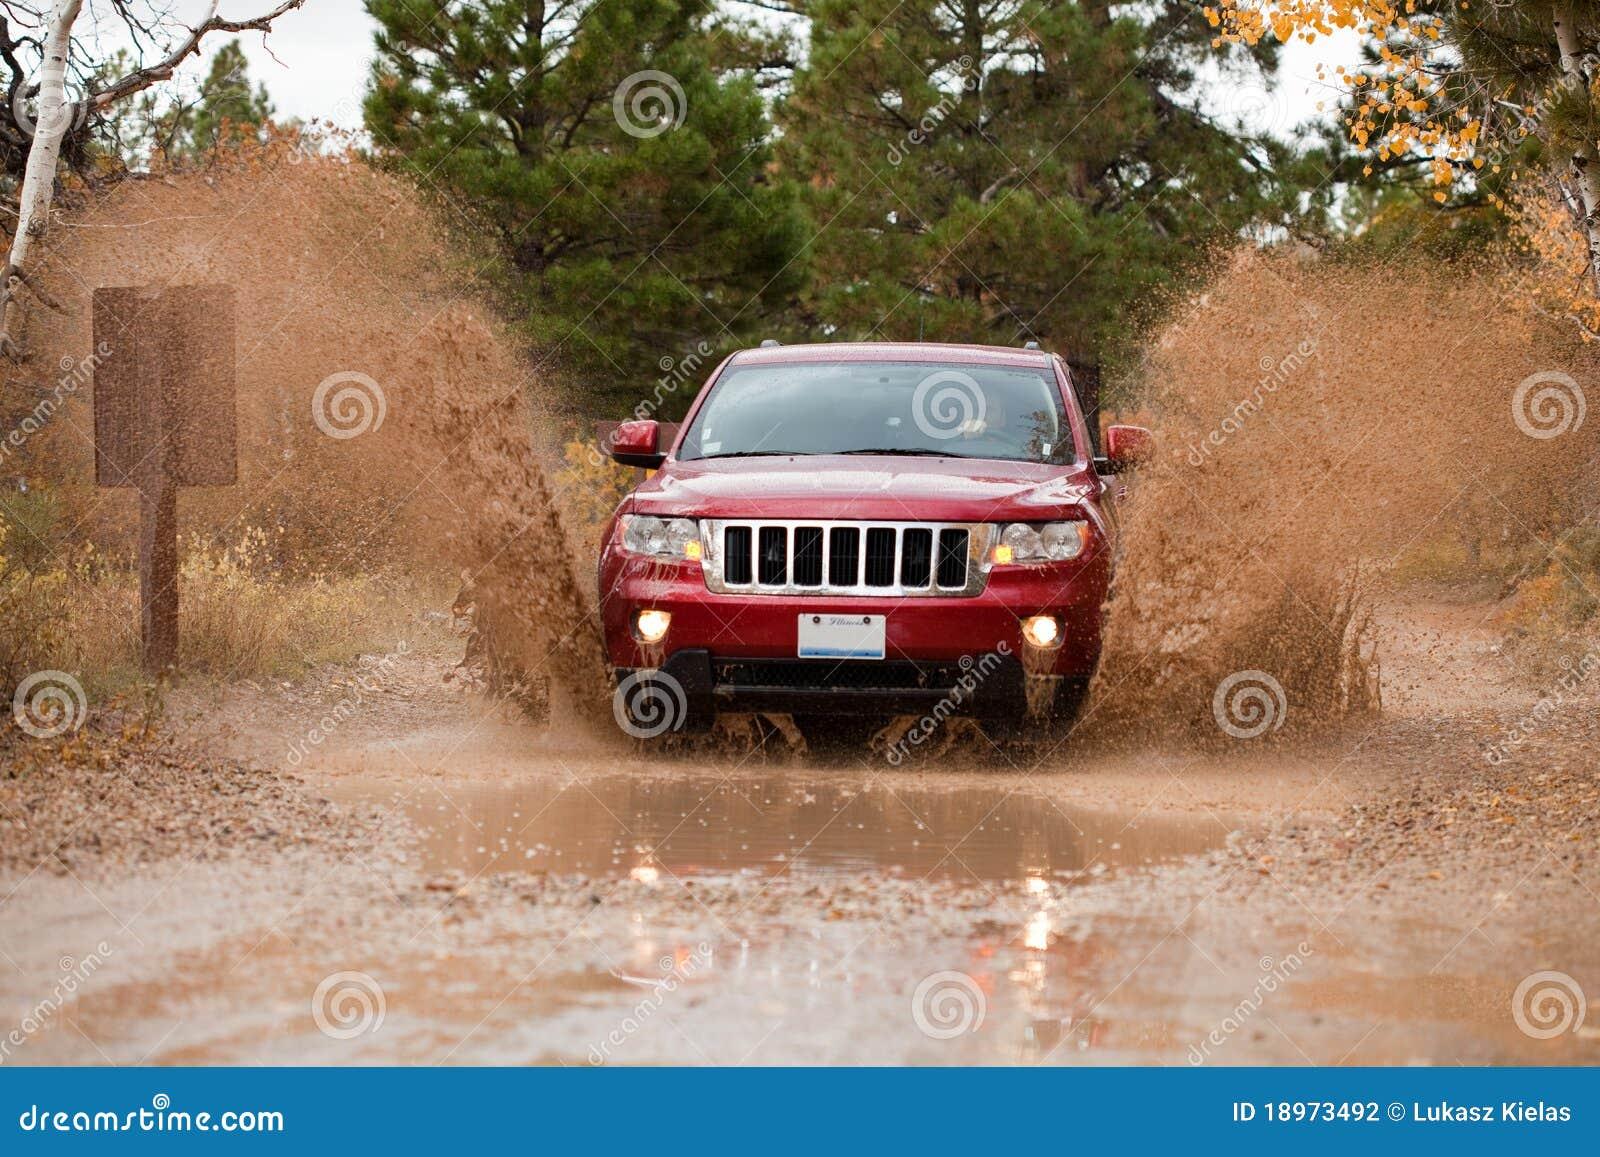 4x4 off road mud challange run